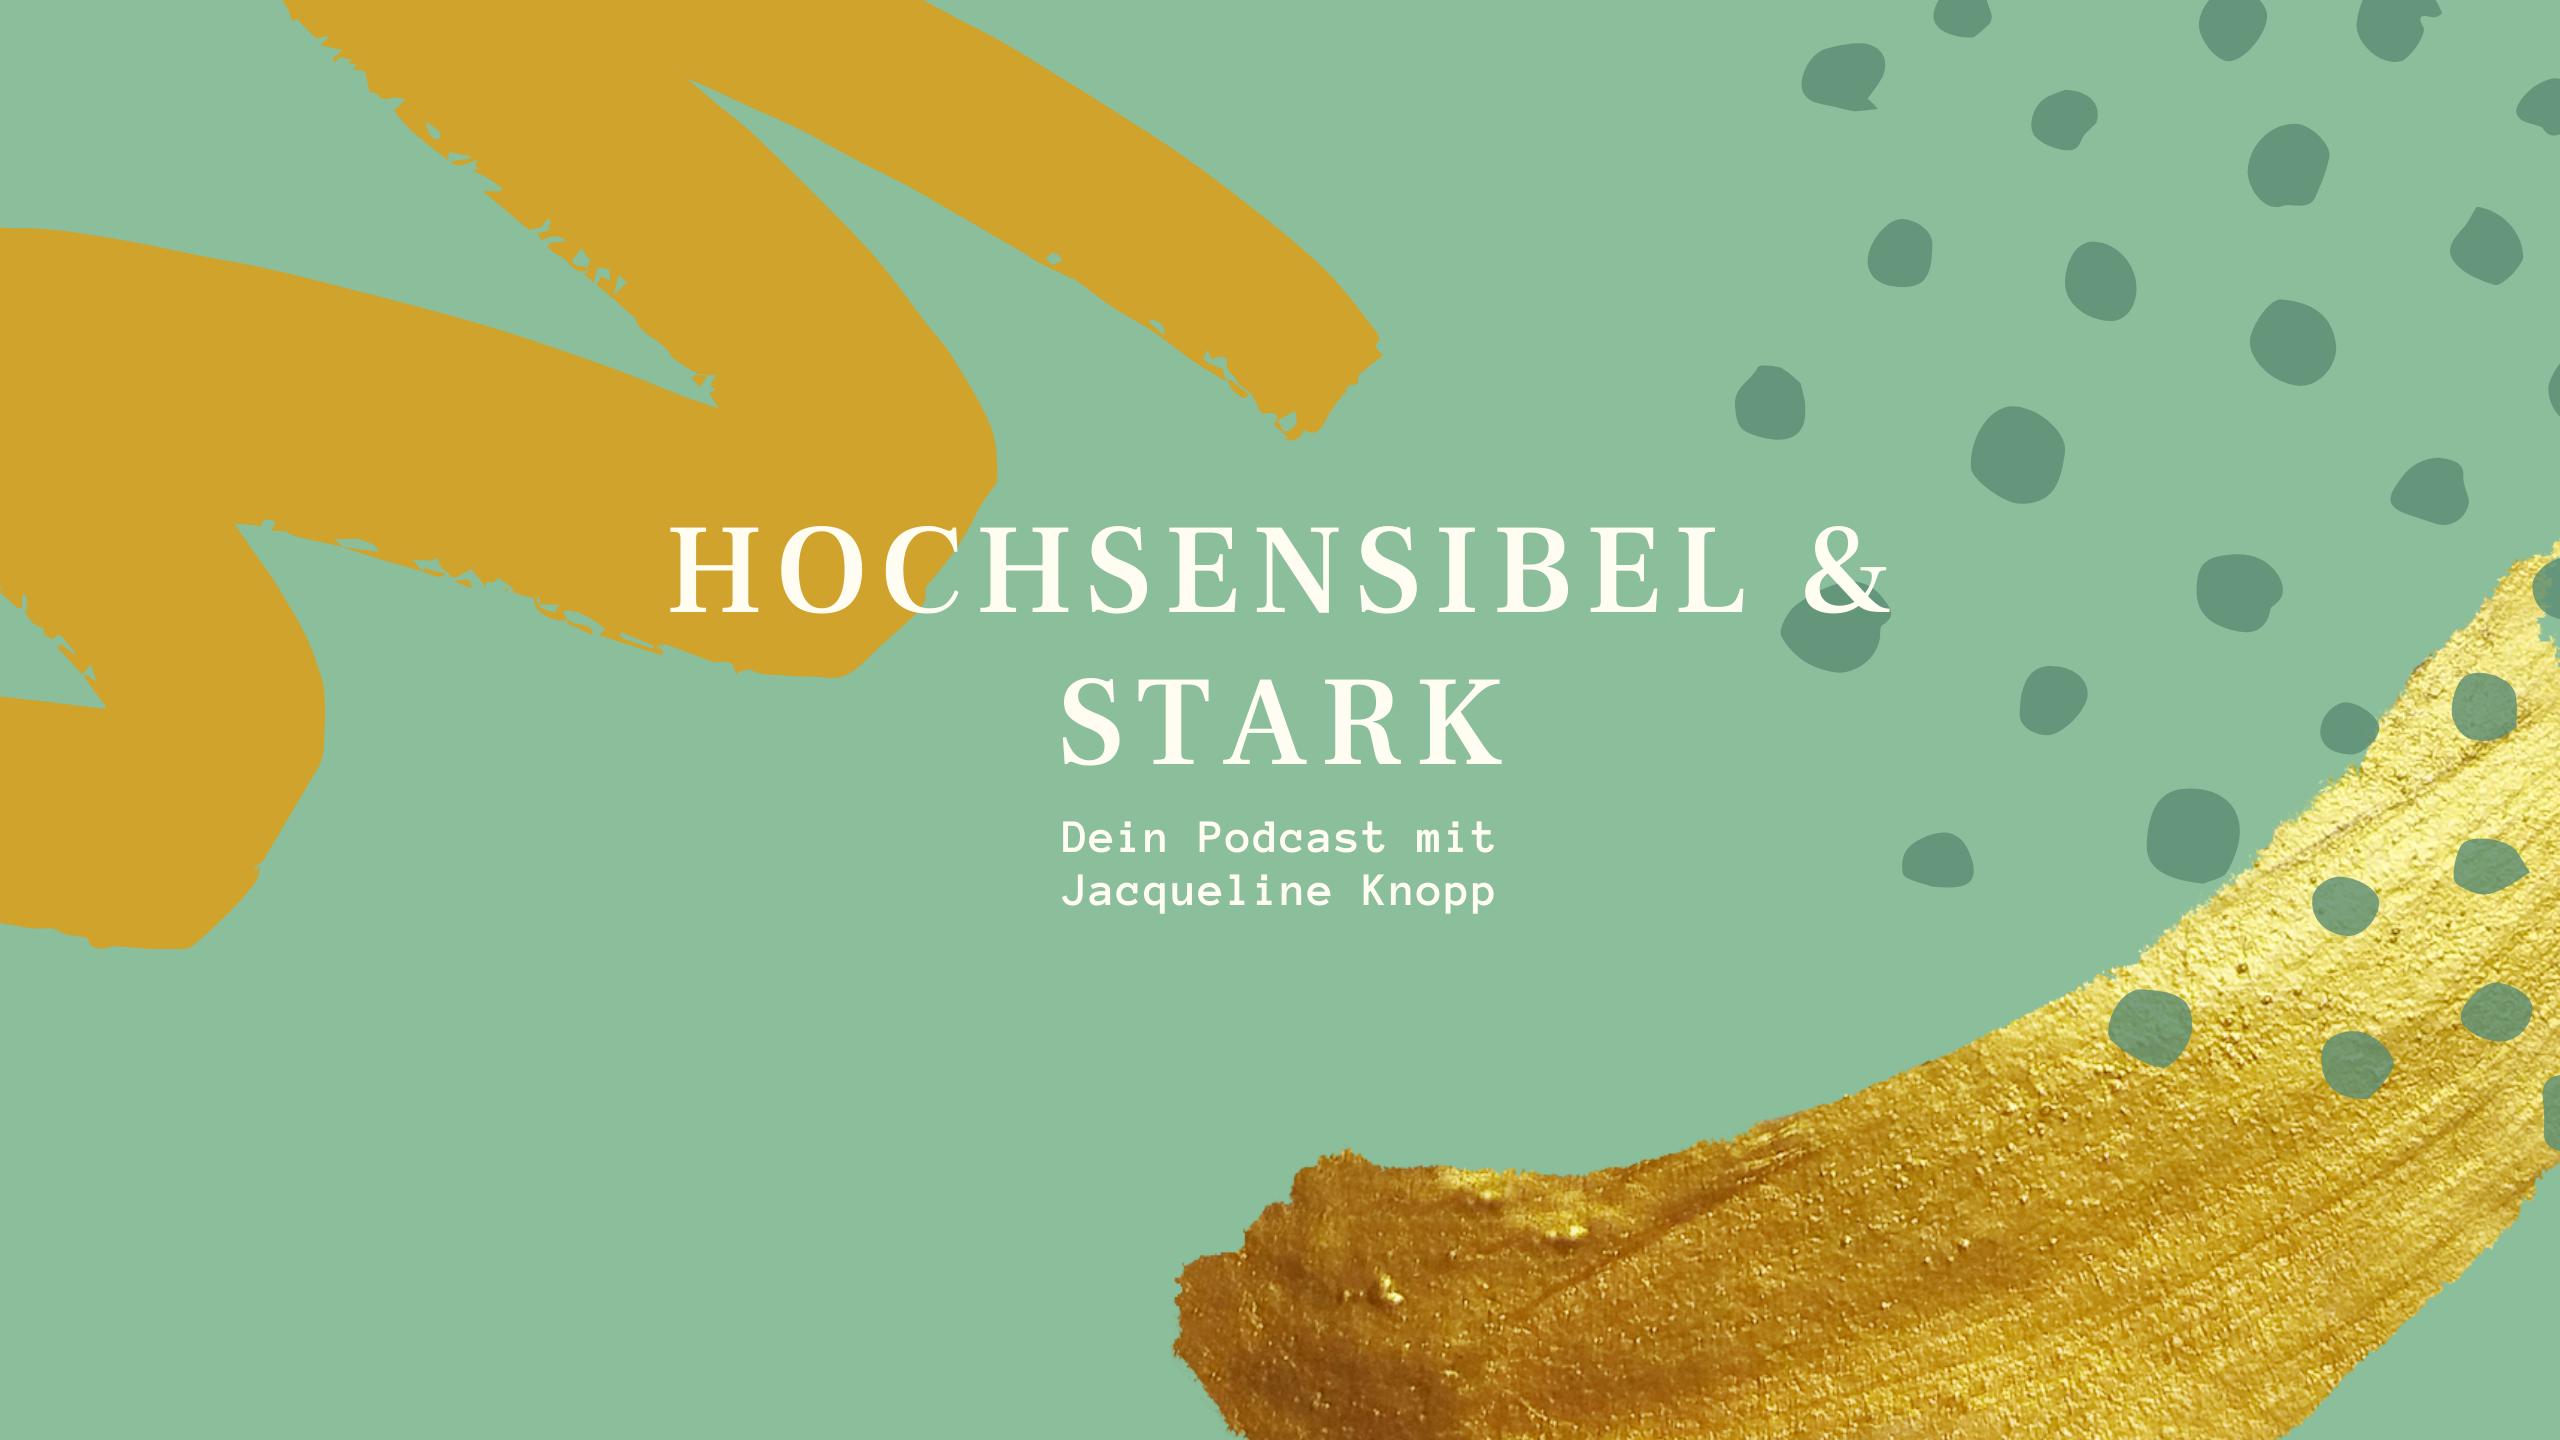 "Mein Podcast: Hochsensibel <span class=""amp"">&</span> stark"